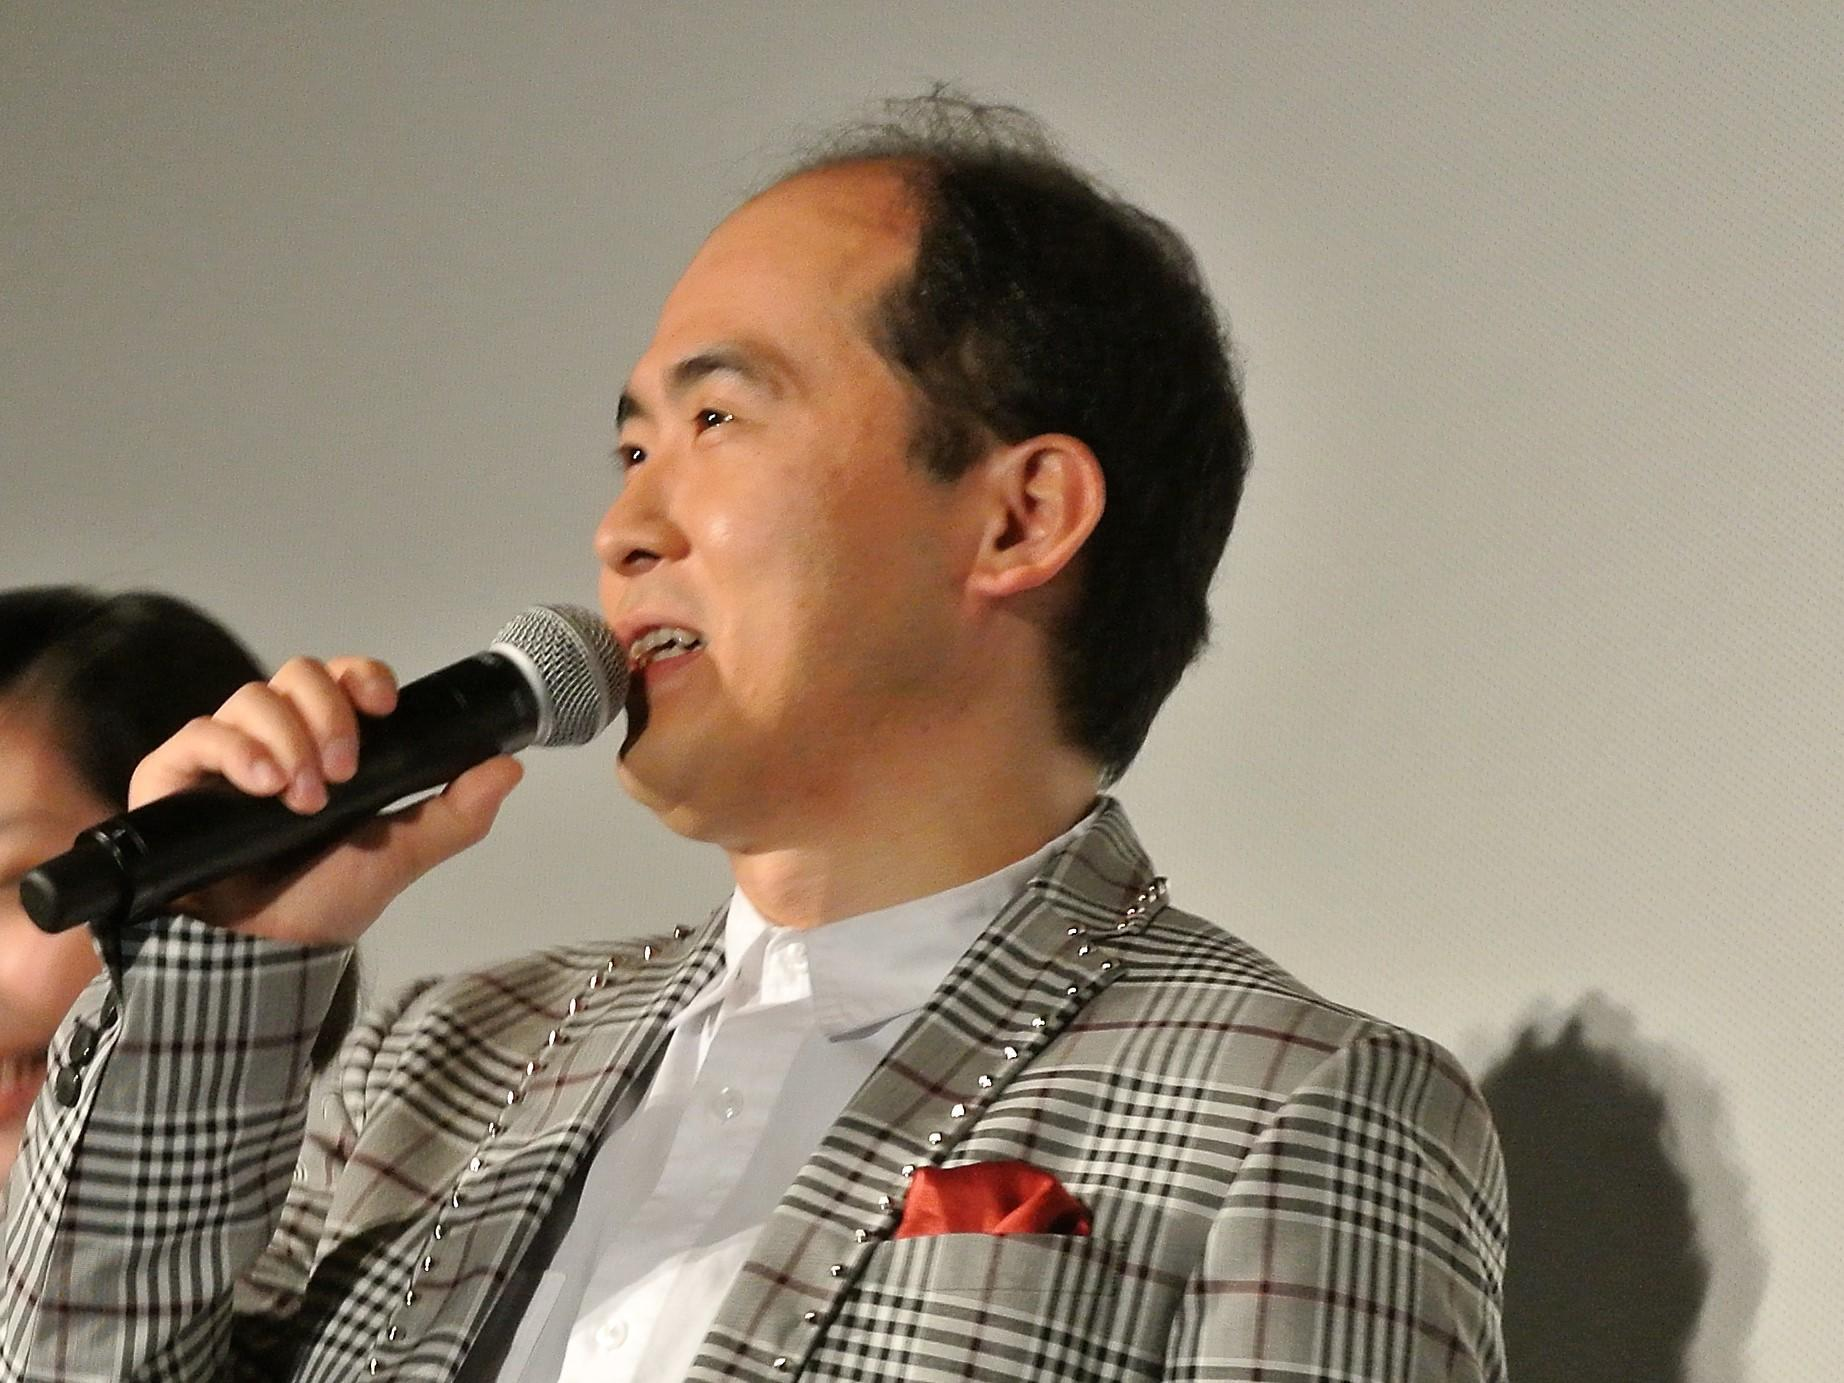 http://news.yoshimoto.co.jp/20170318134901-821b93c43c710c12525fd78f228e22ea879f0161.jpg